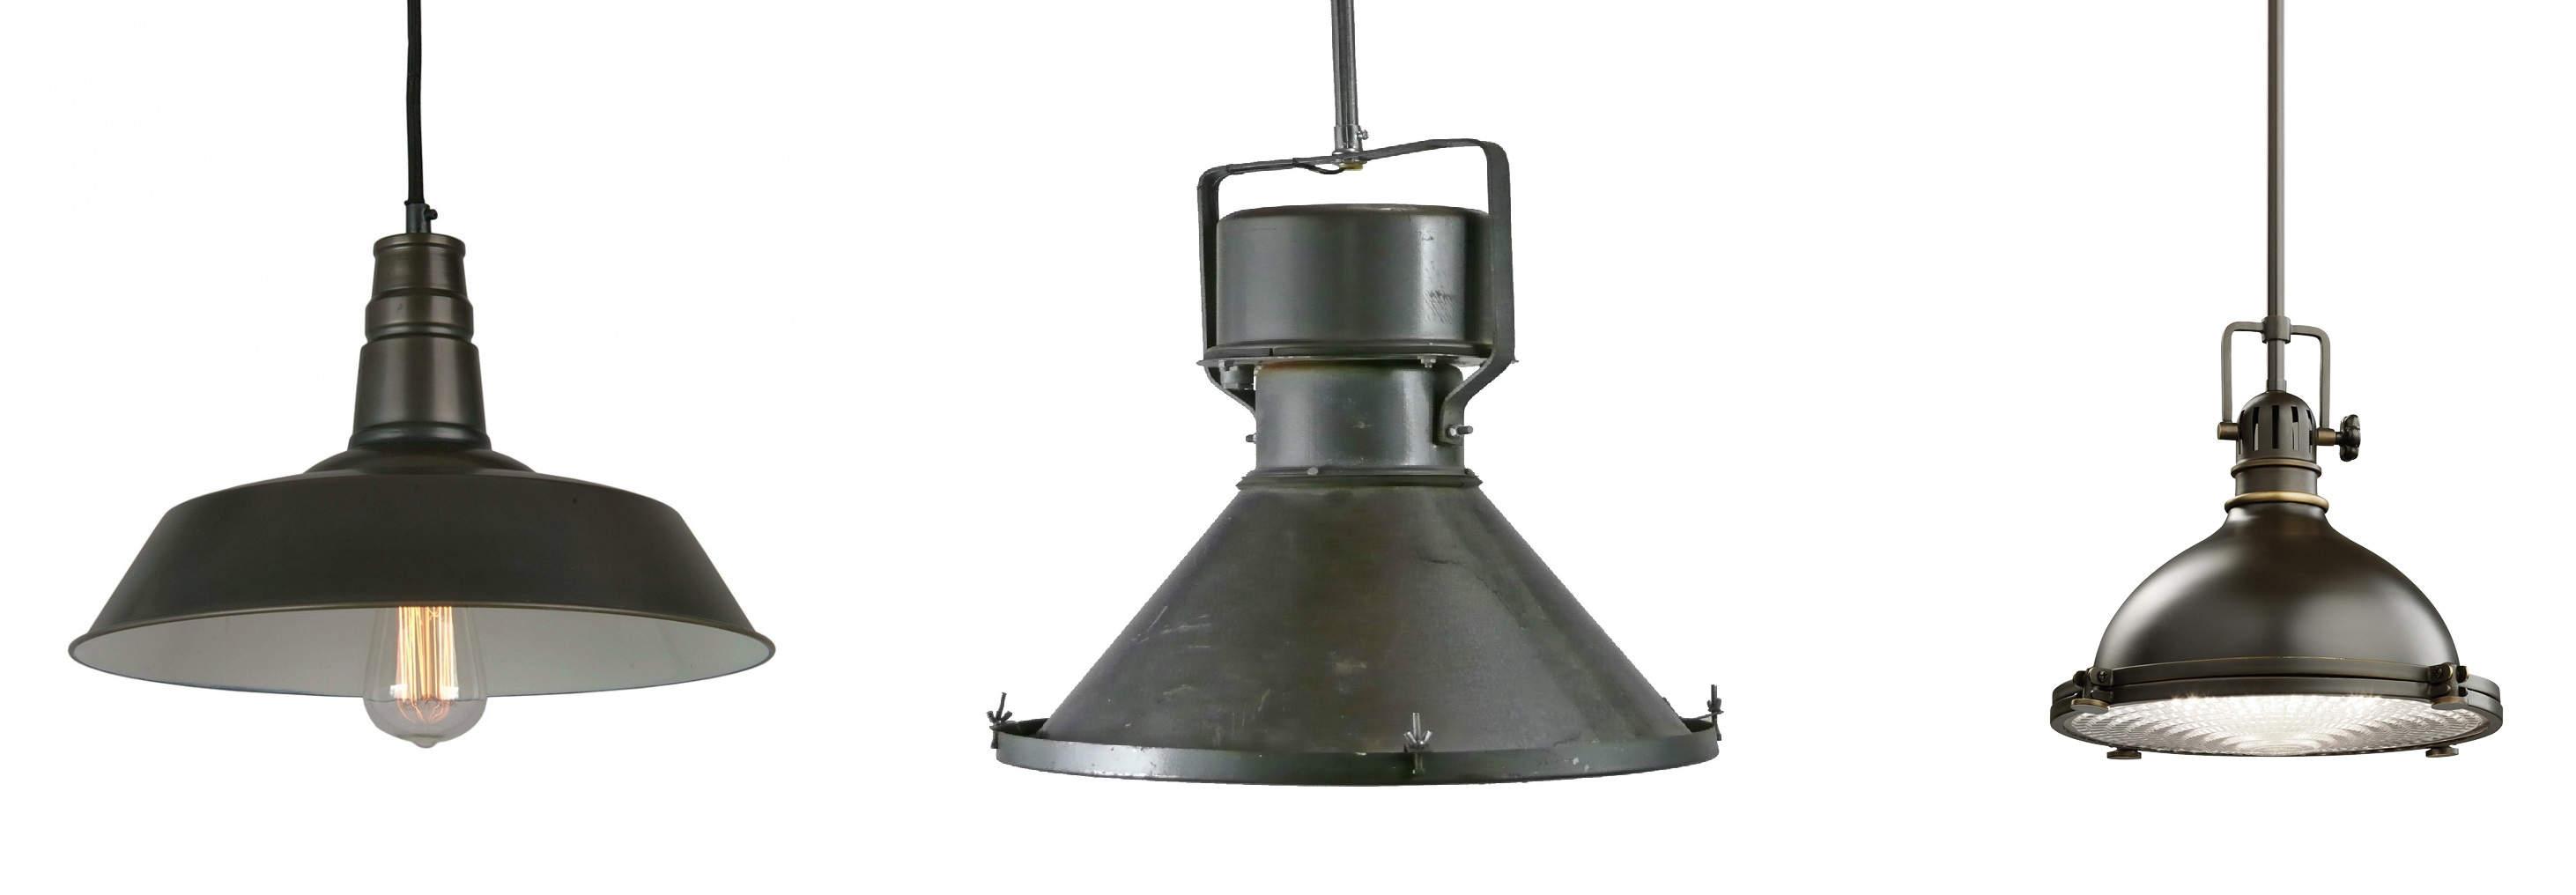 INDUSTRIAL LAMPS: Λάμπες σε βιομηχανικό σχεδιασμό για τοποθέτηση στο ταβάνι. Προσδίδουν ιδιαίτερο ύφος και χαρακτήρα σε οποιοδήποτε μπαρμπεράδικο.